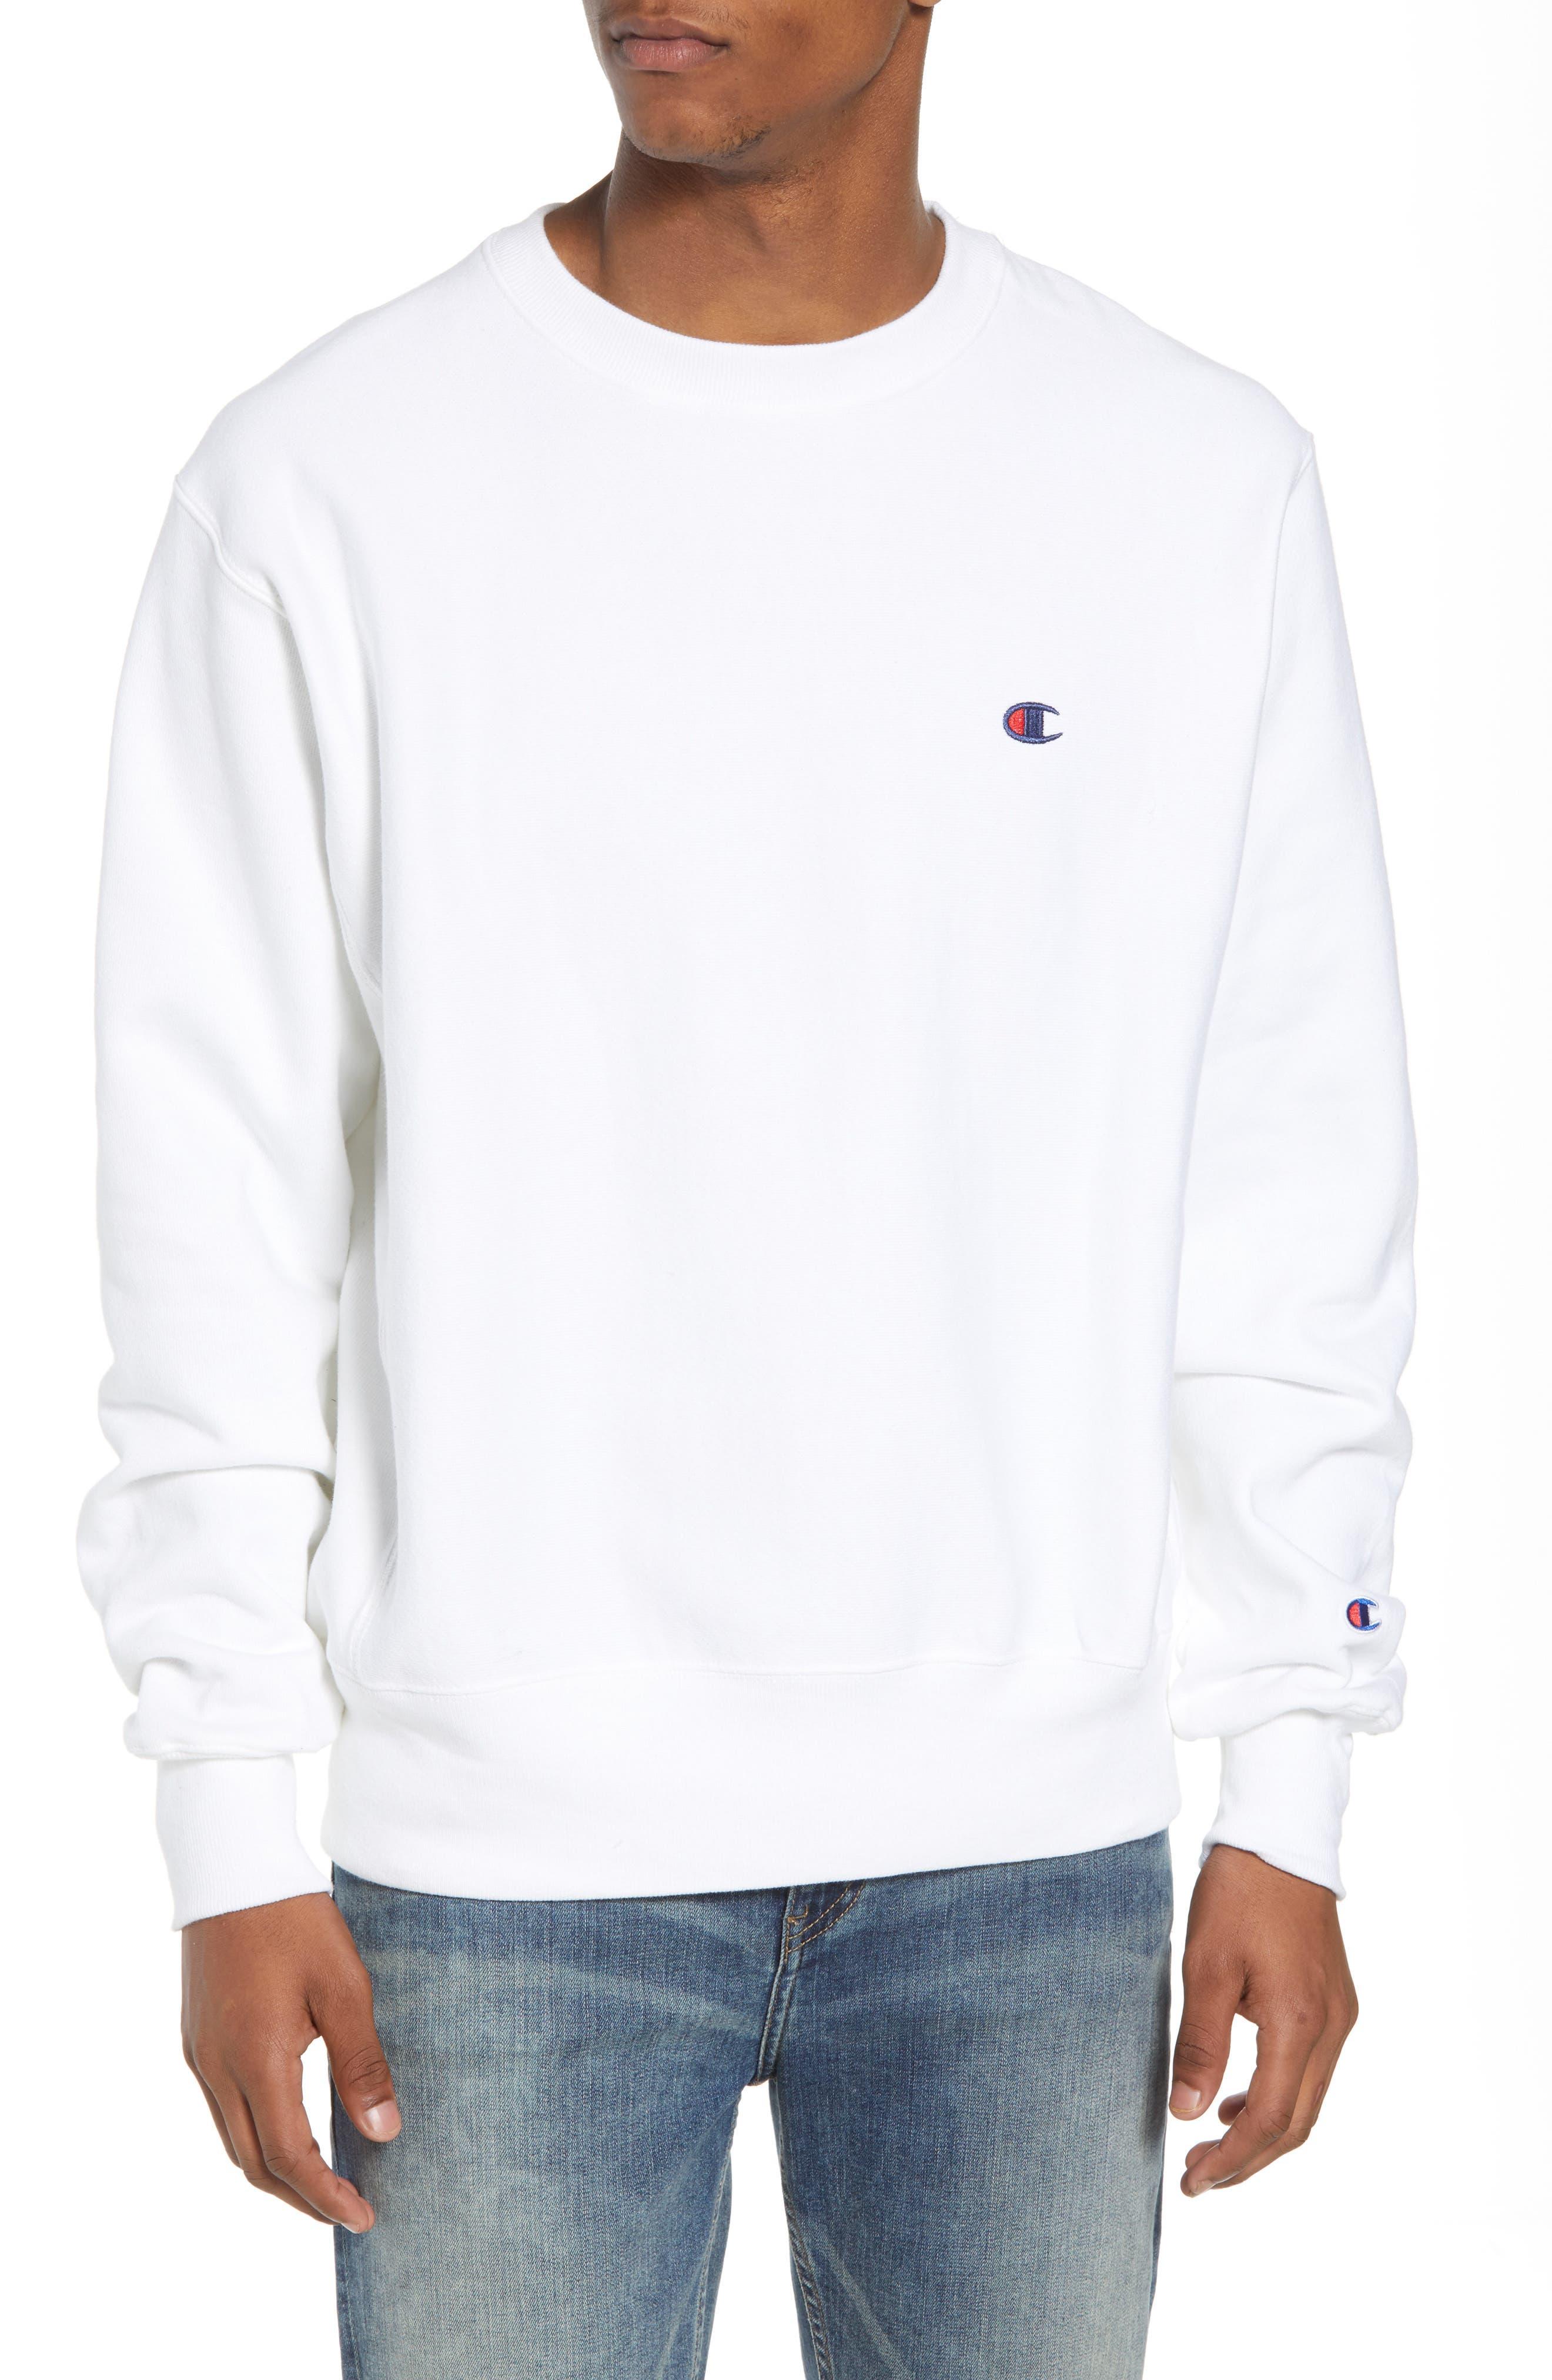 Reverse Weave Crew Sweatshirt